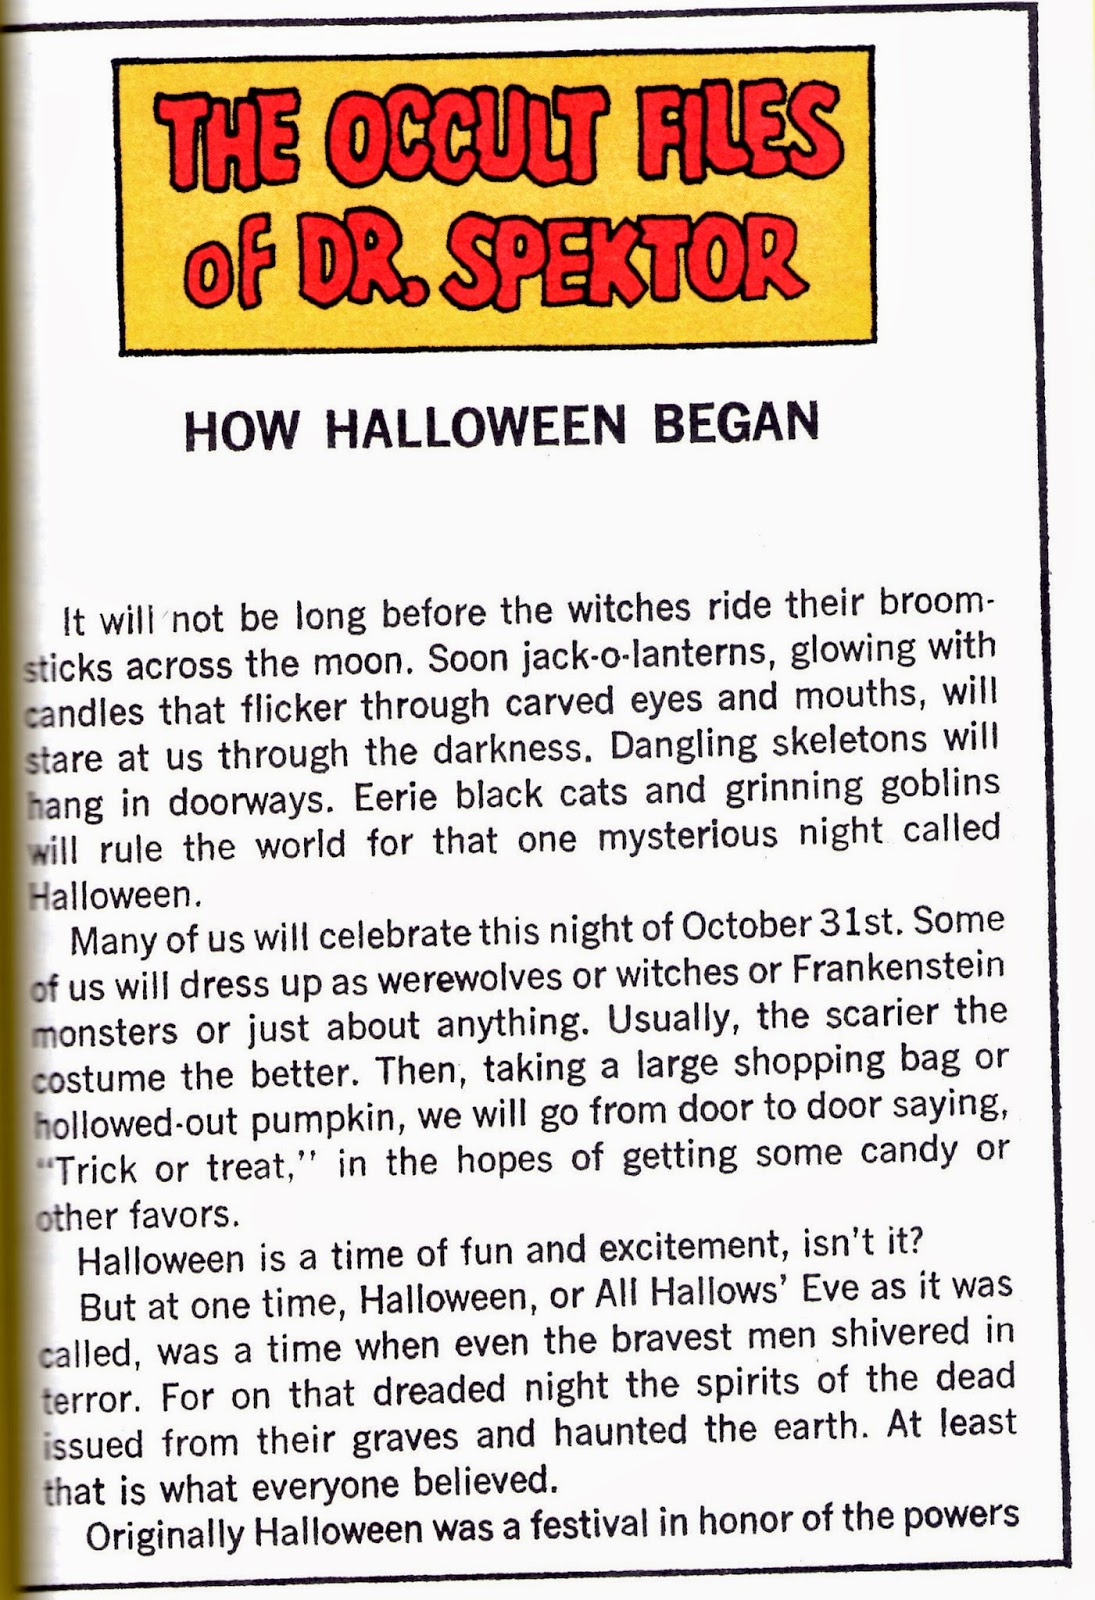 dr spektor tells us how halloween began